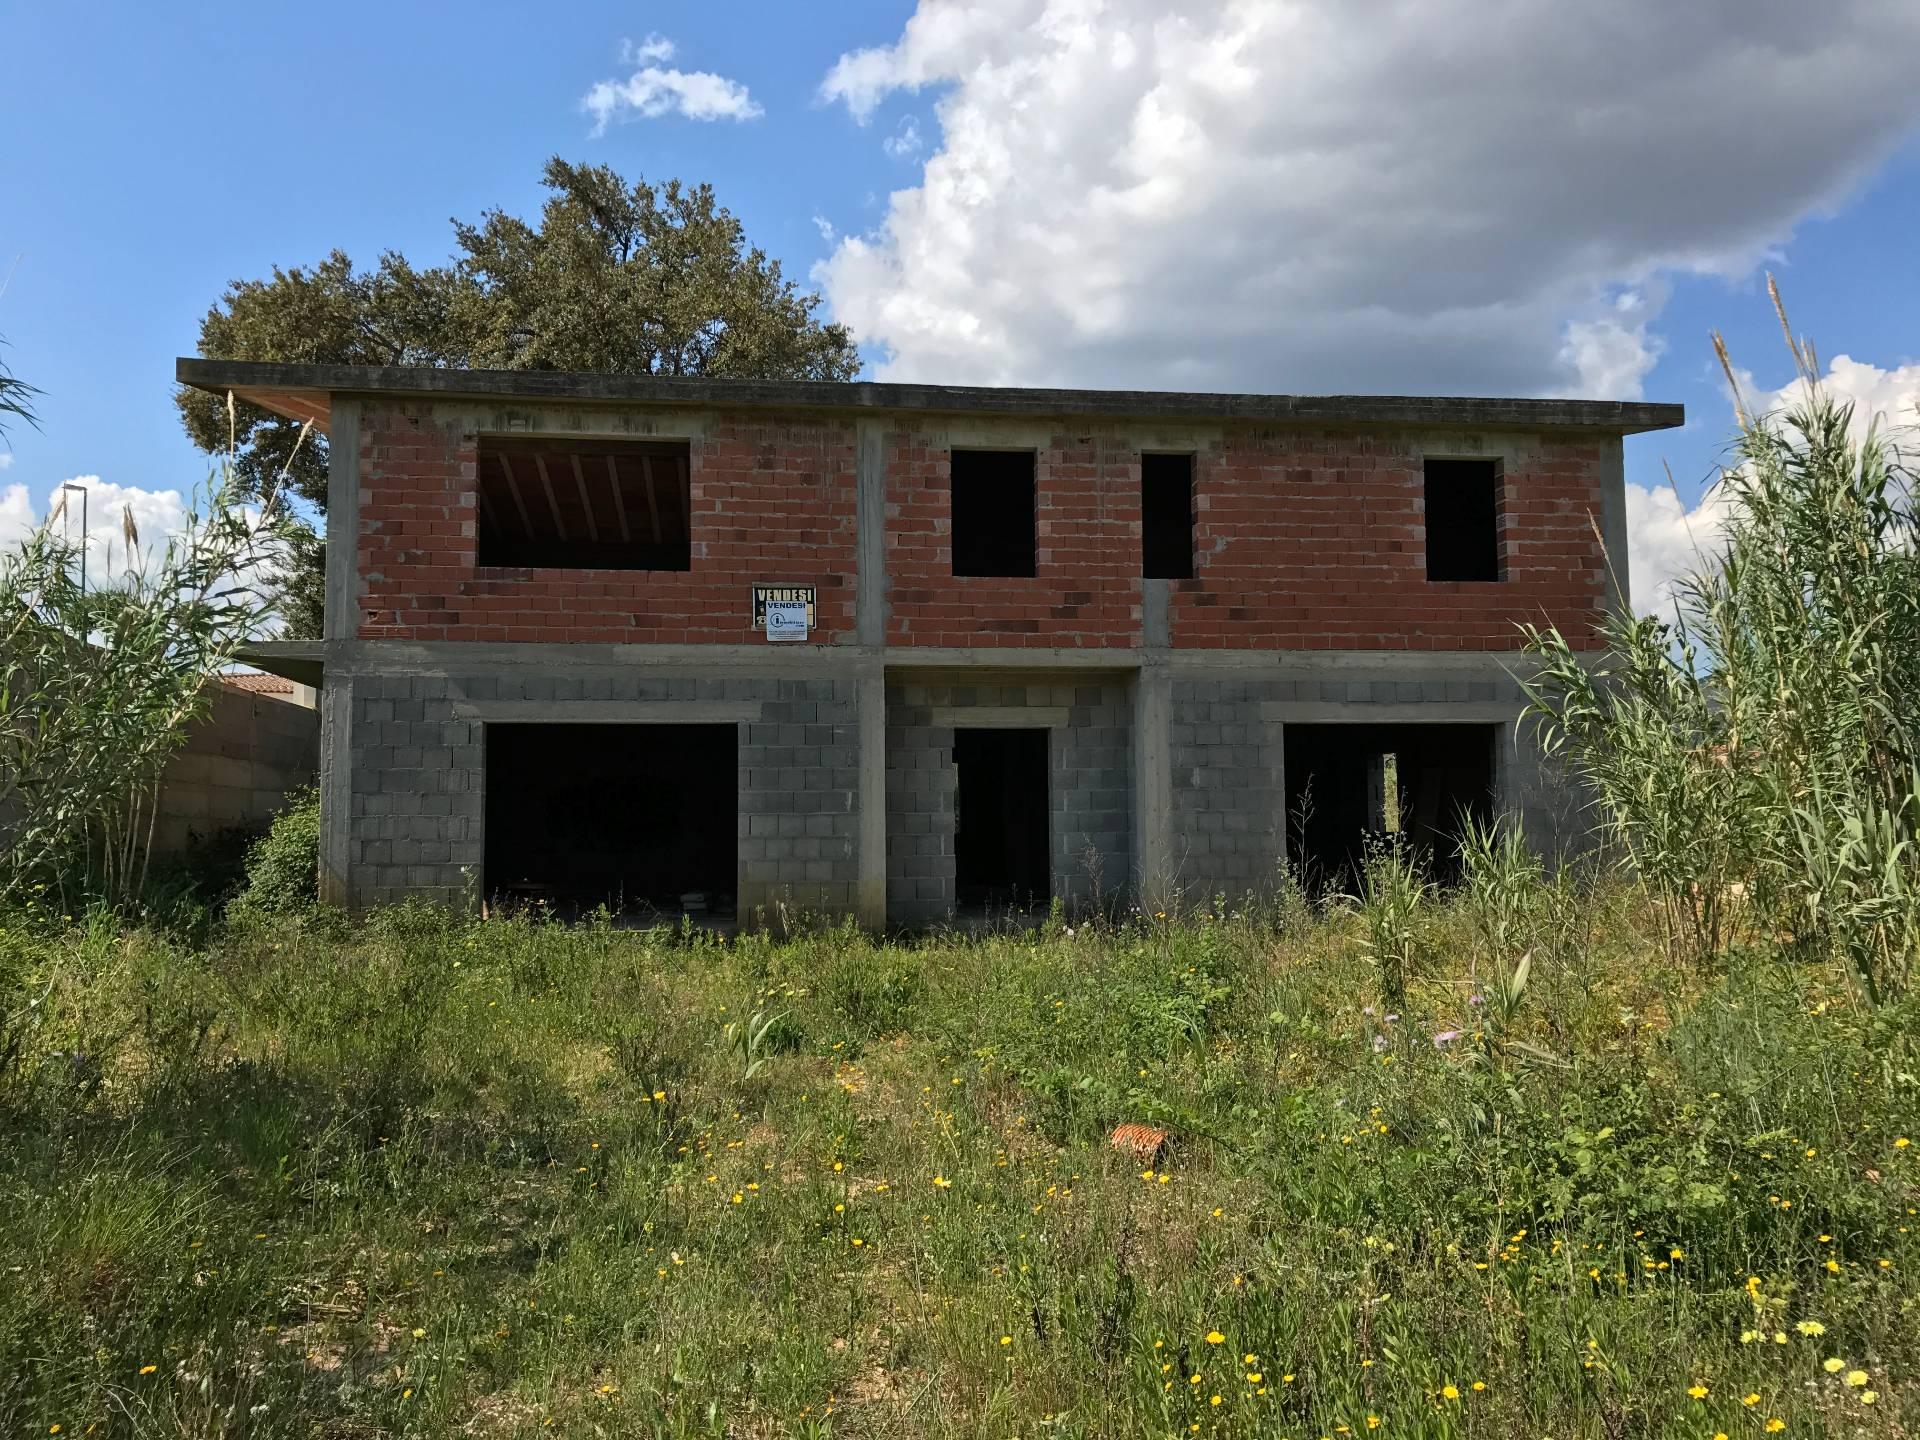 Soluzione Indipendente in vendita a Girasole, 5 locali, Trattative riservate | CambioCasa.it